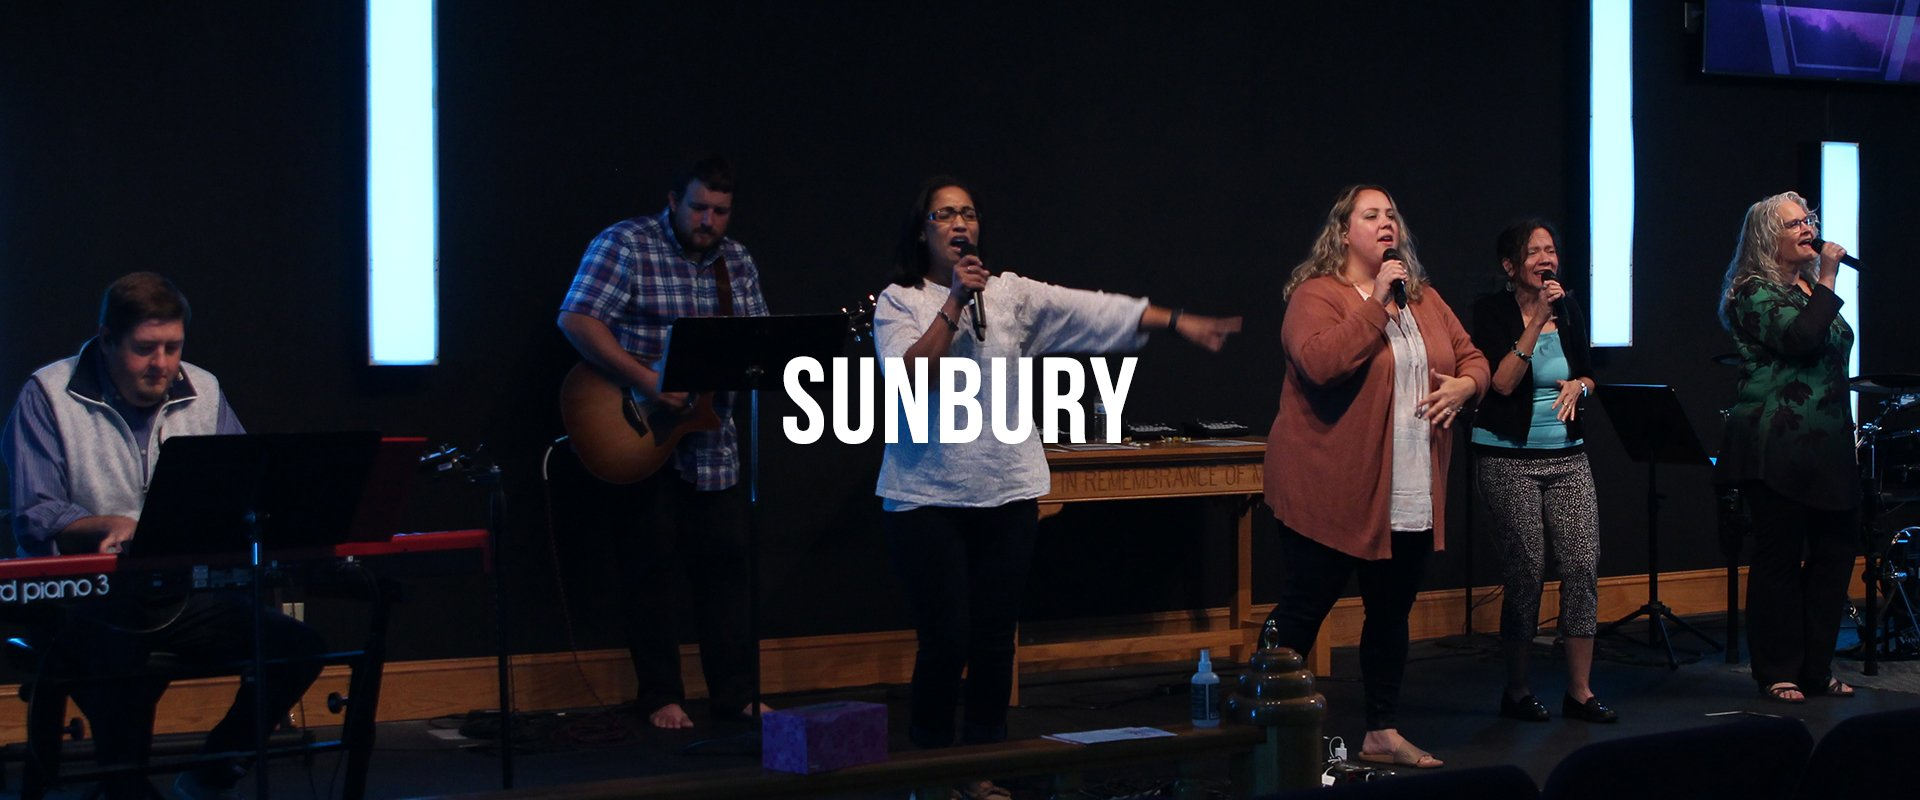 Sunbury-header-update